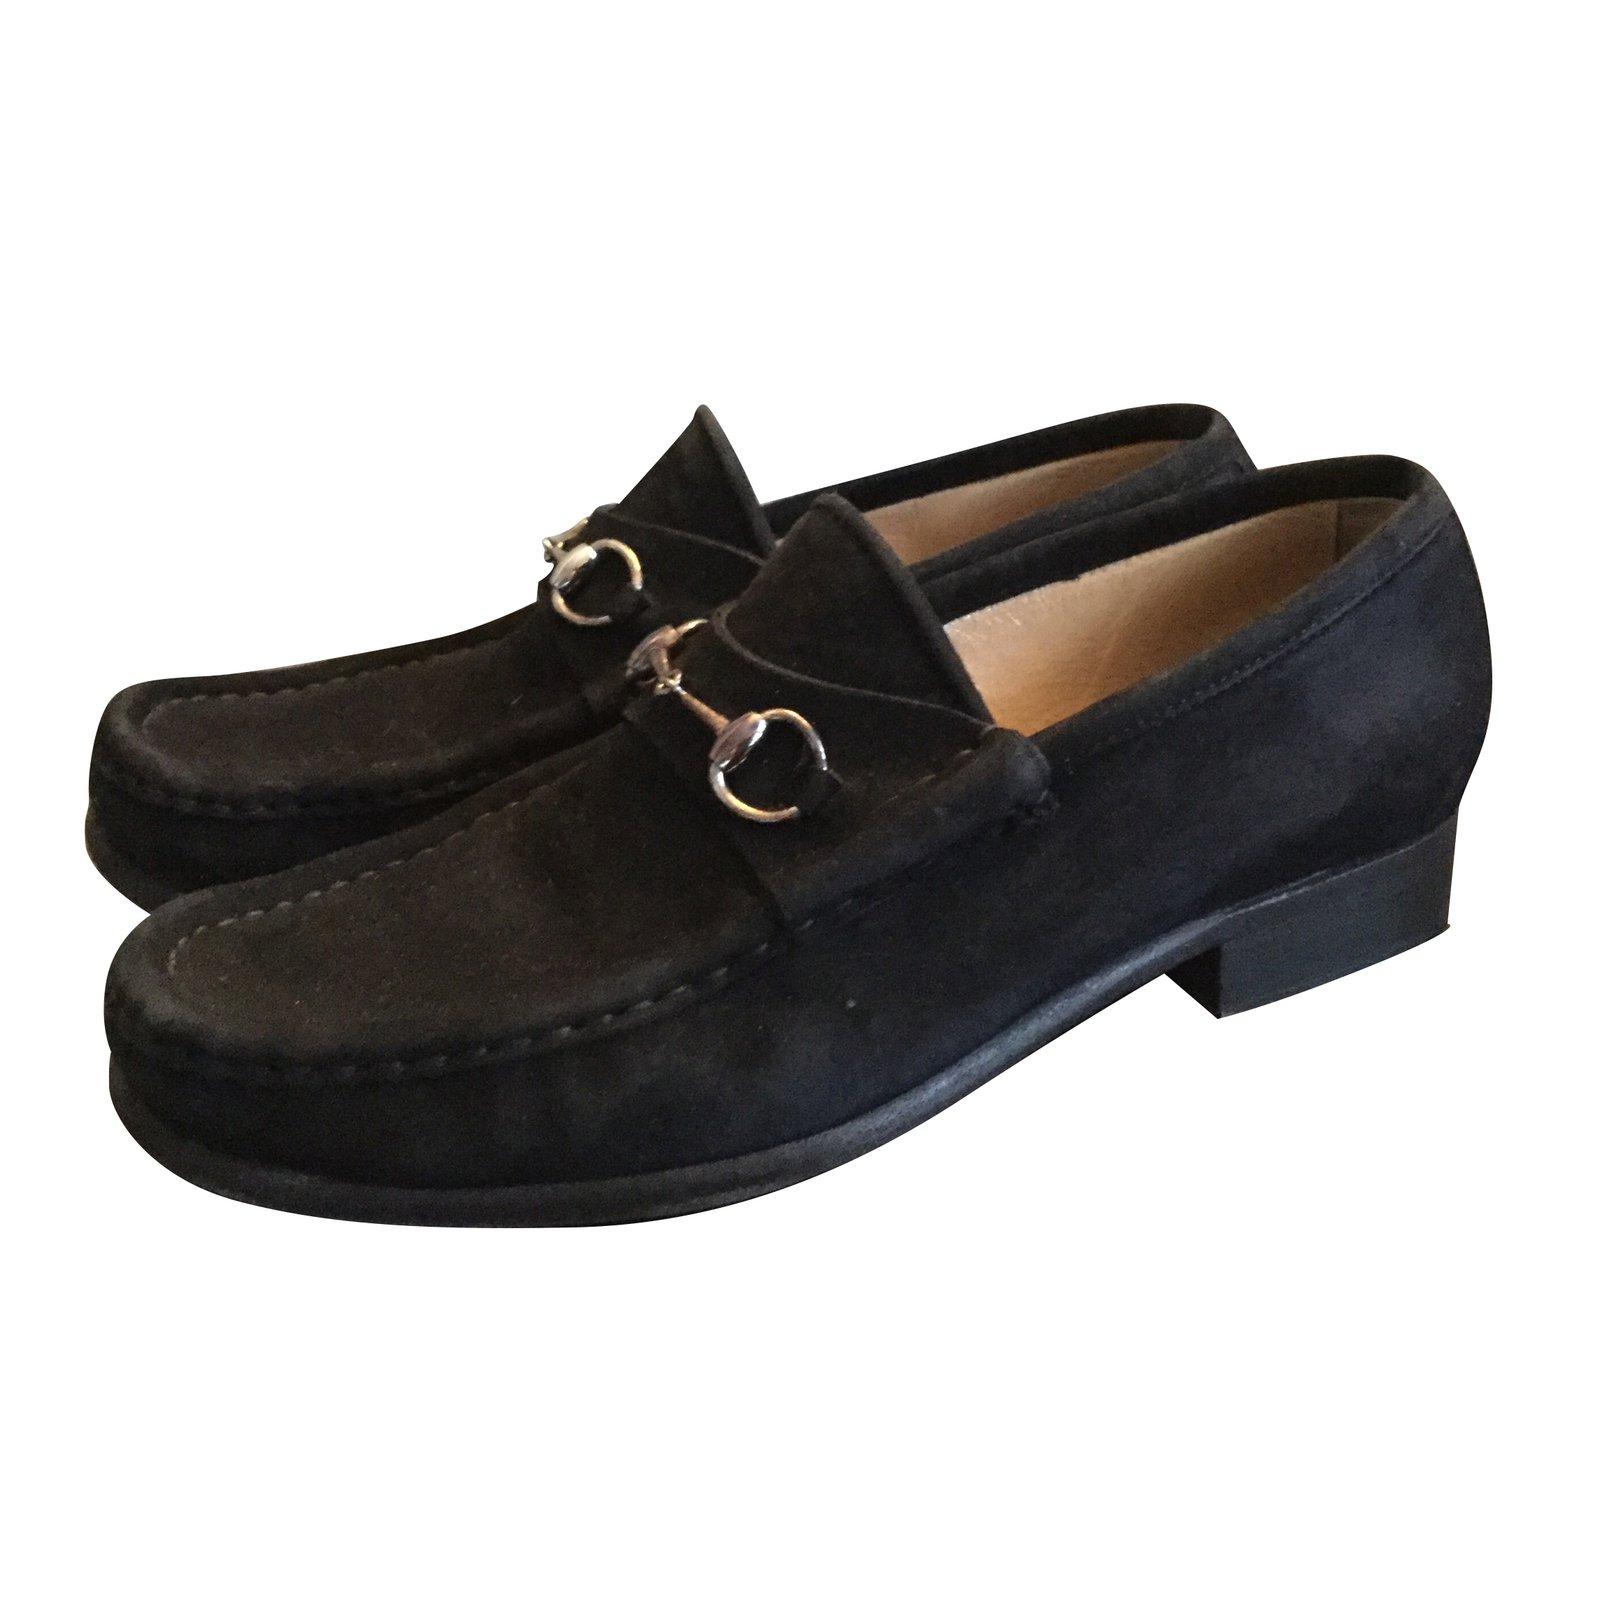 Gucci Gucci loafers Flats Suede Black ref.55052 - Joli Closet 03a9d181b675